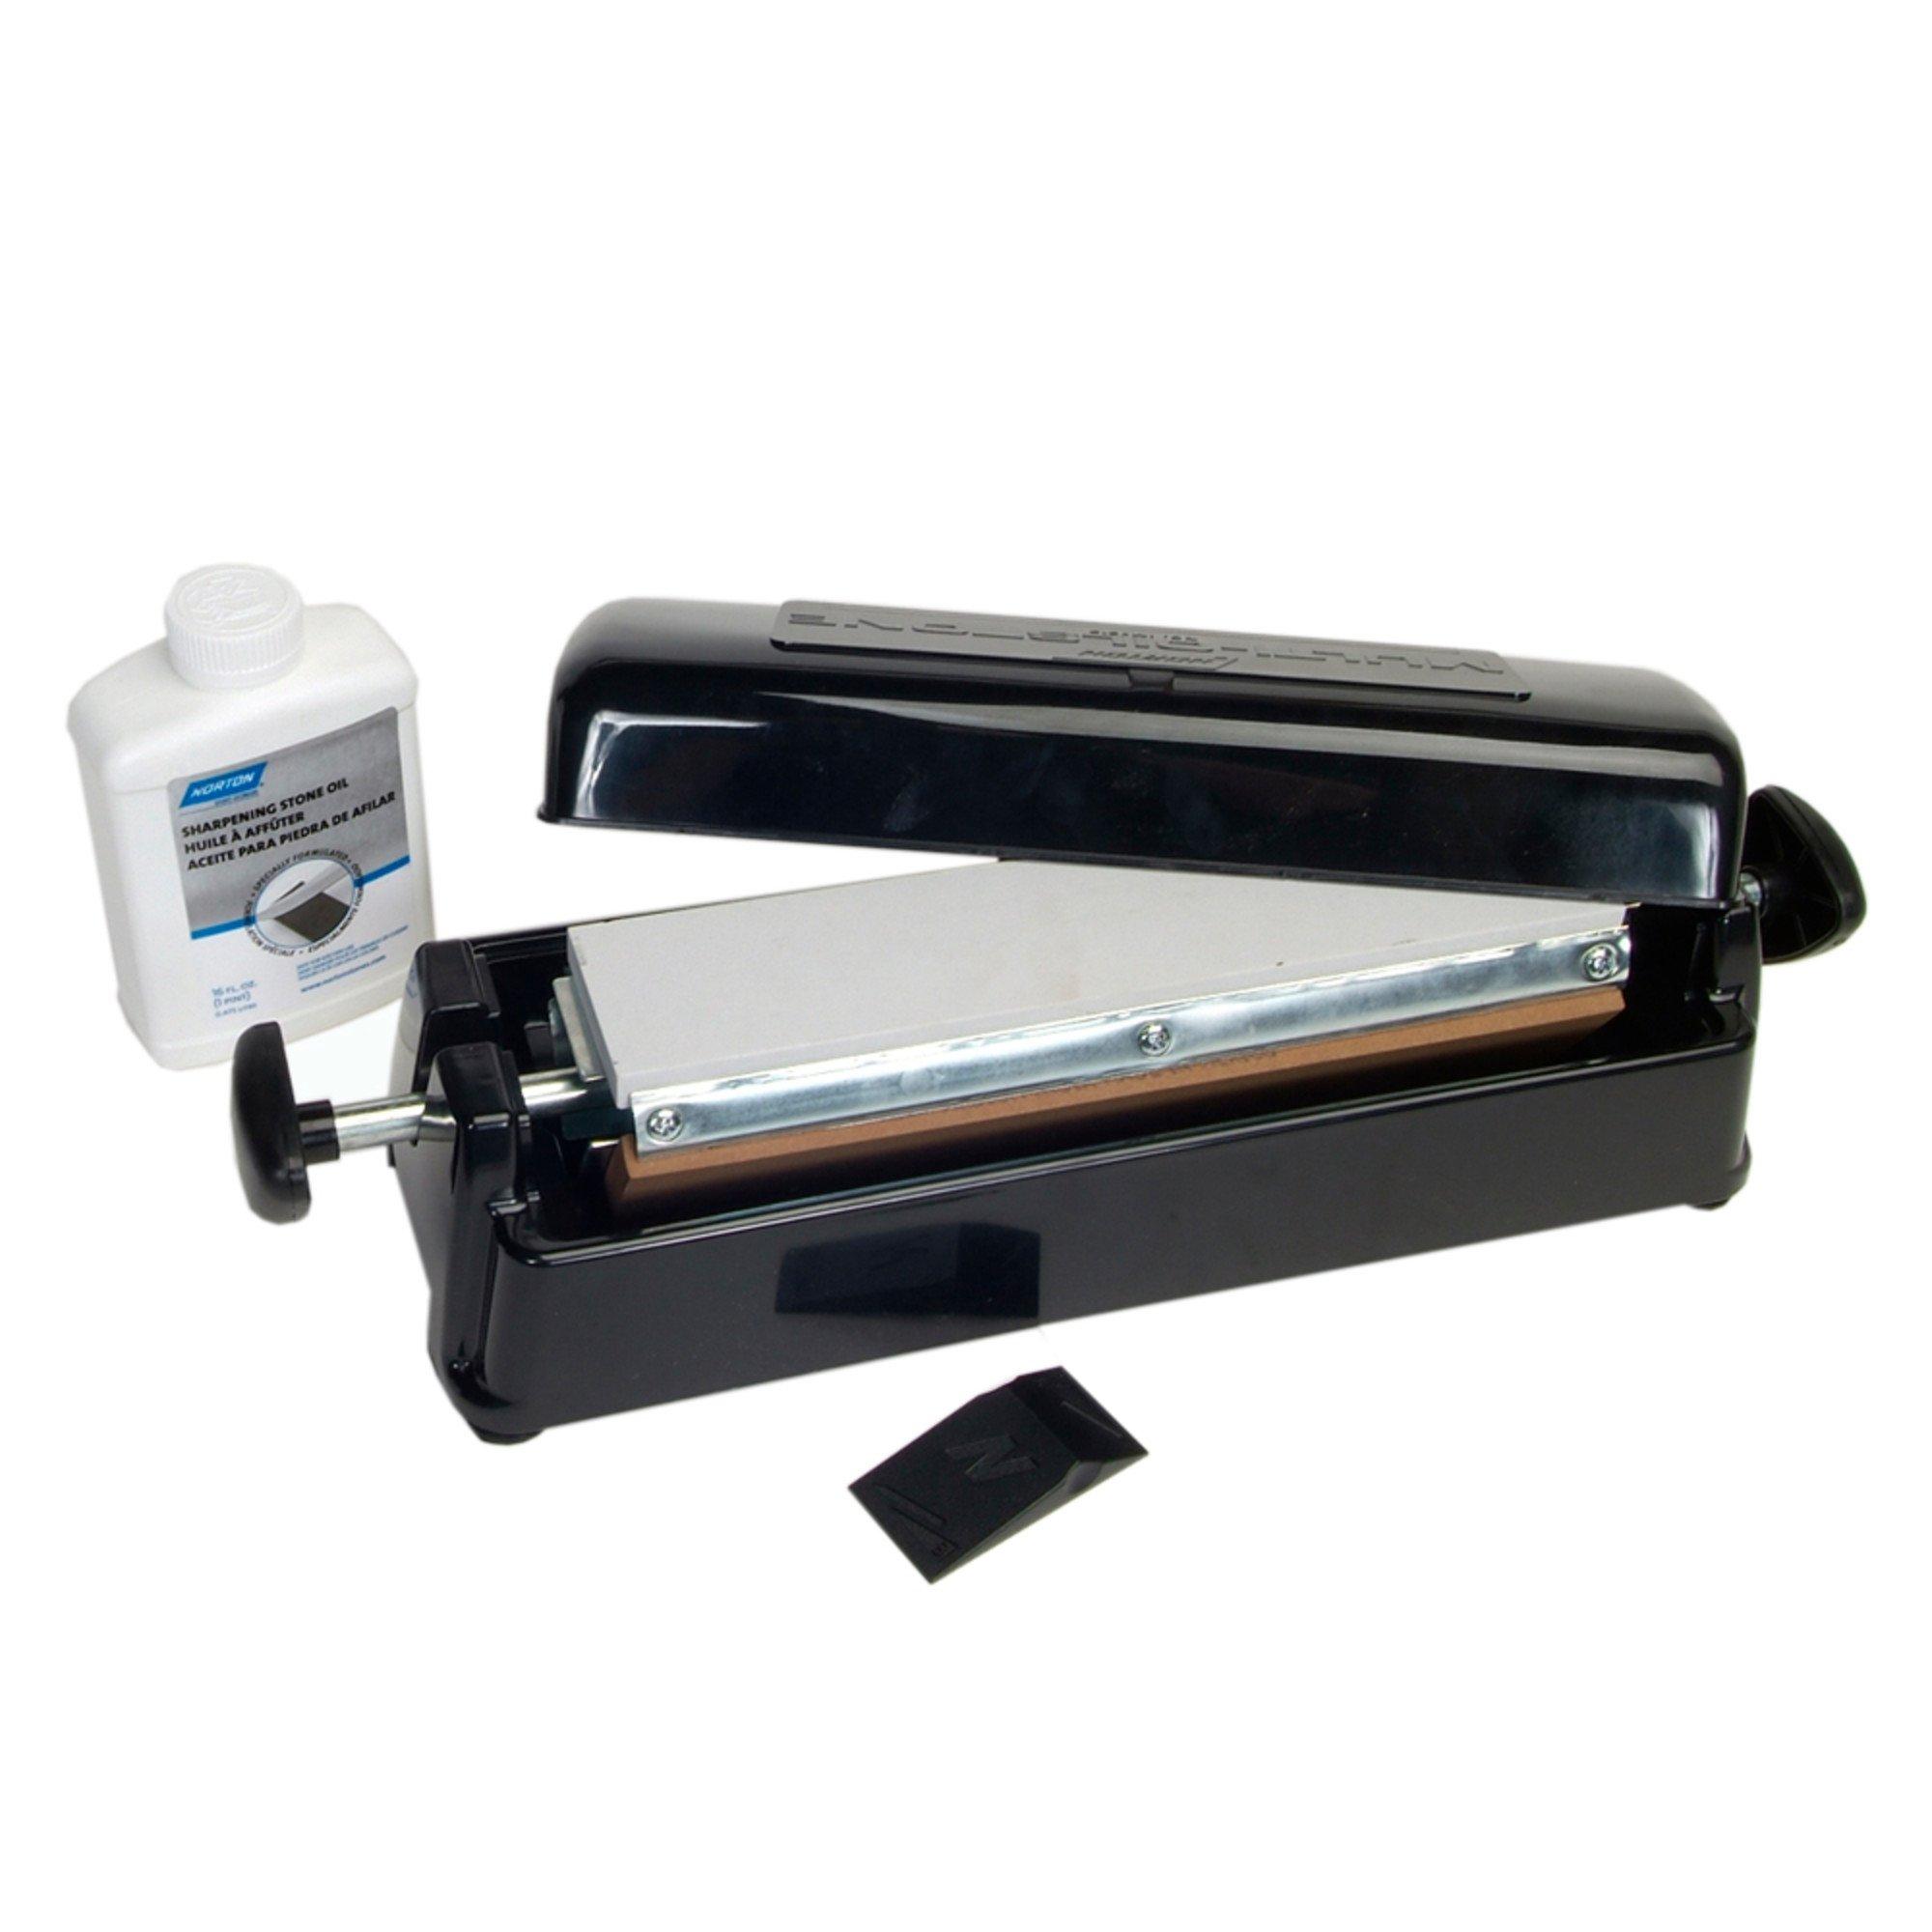 Norton IM 313CIS Soft Arkansas Sharpening Kit